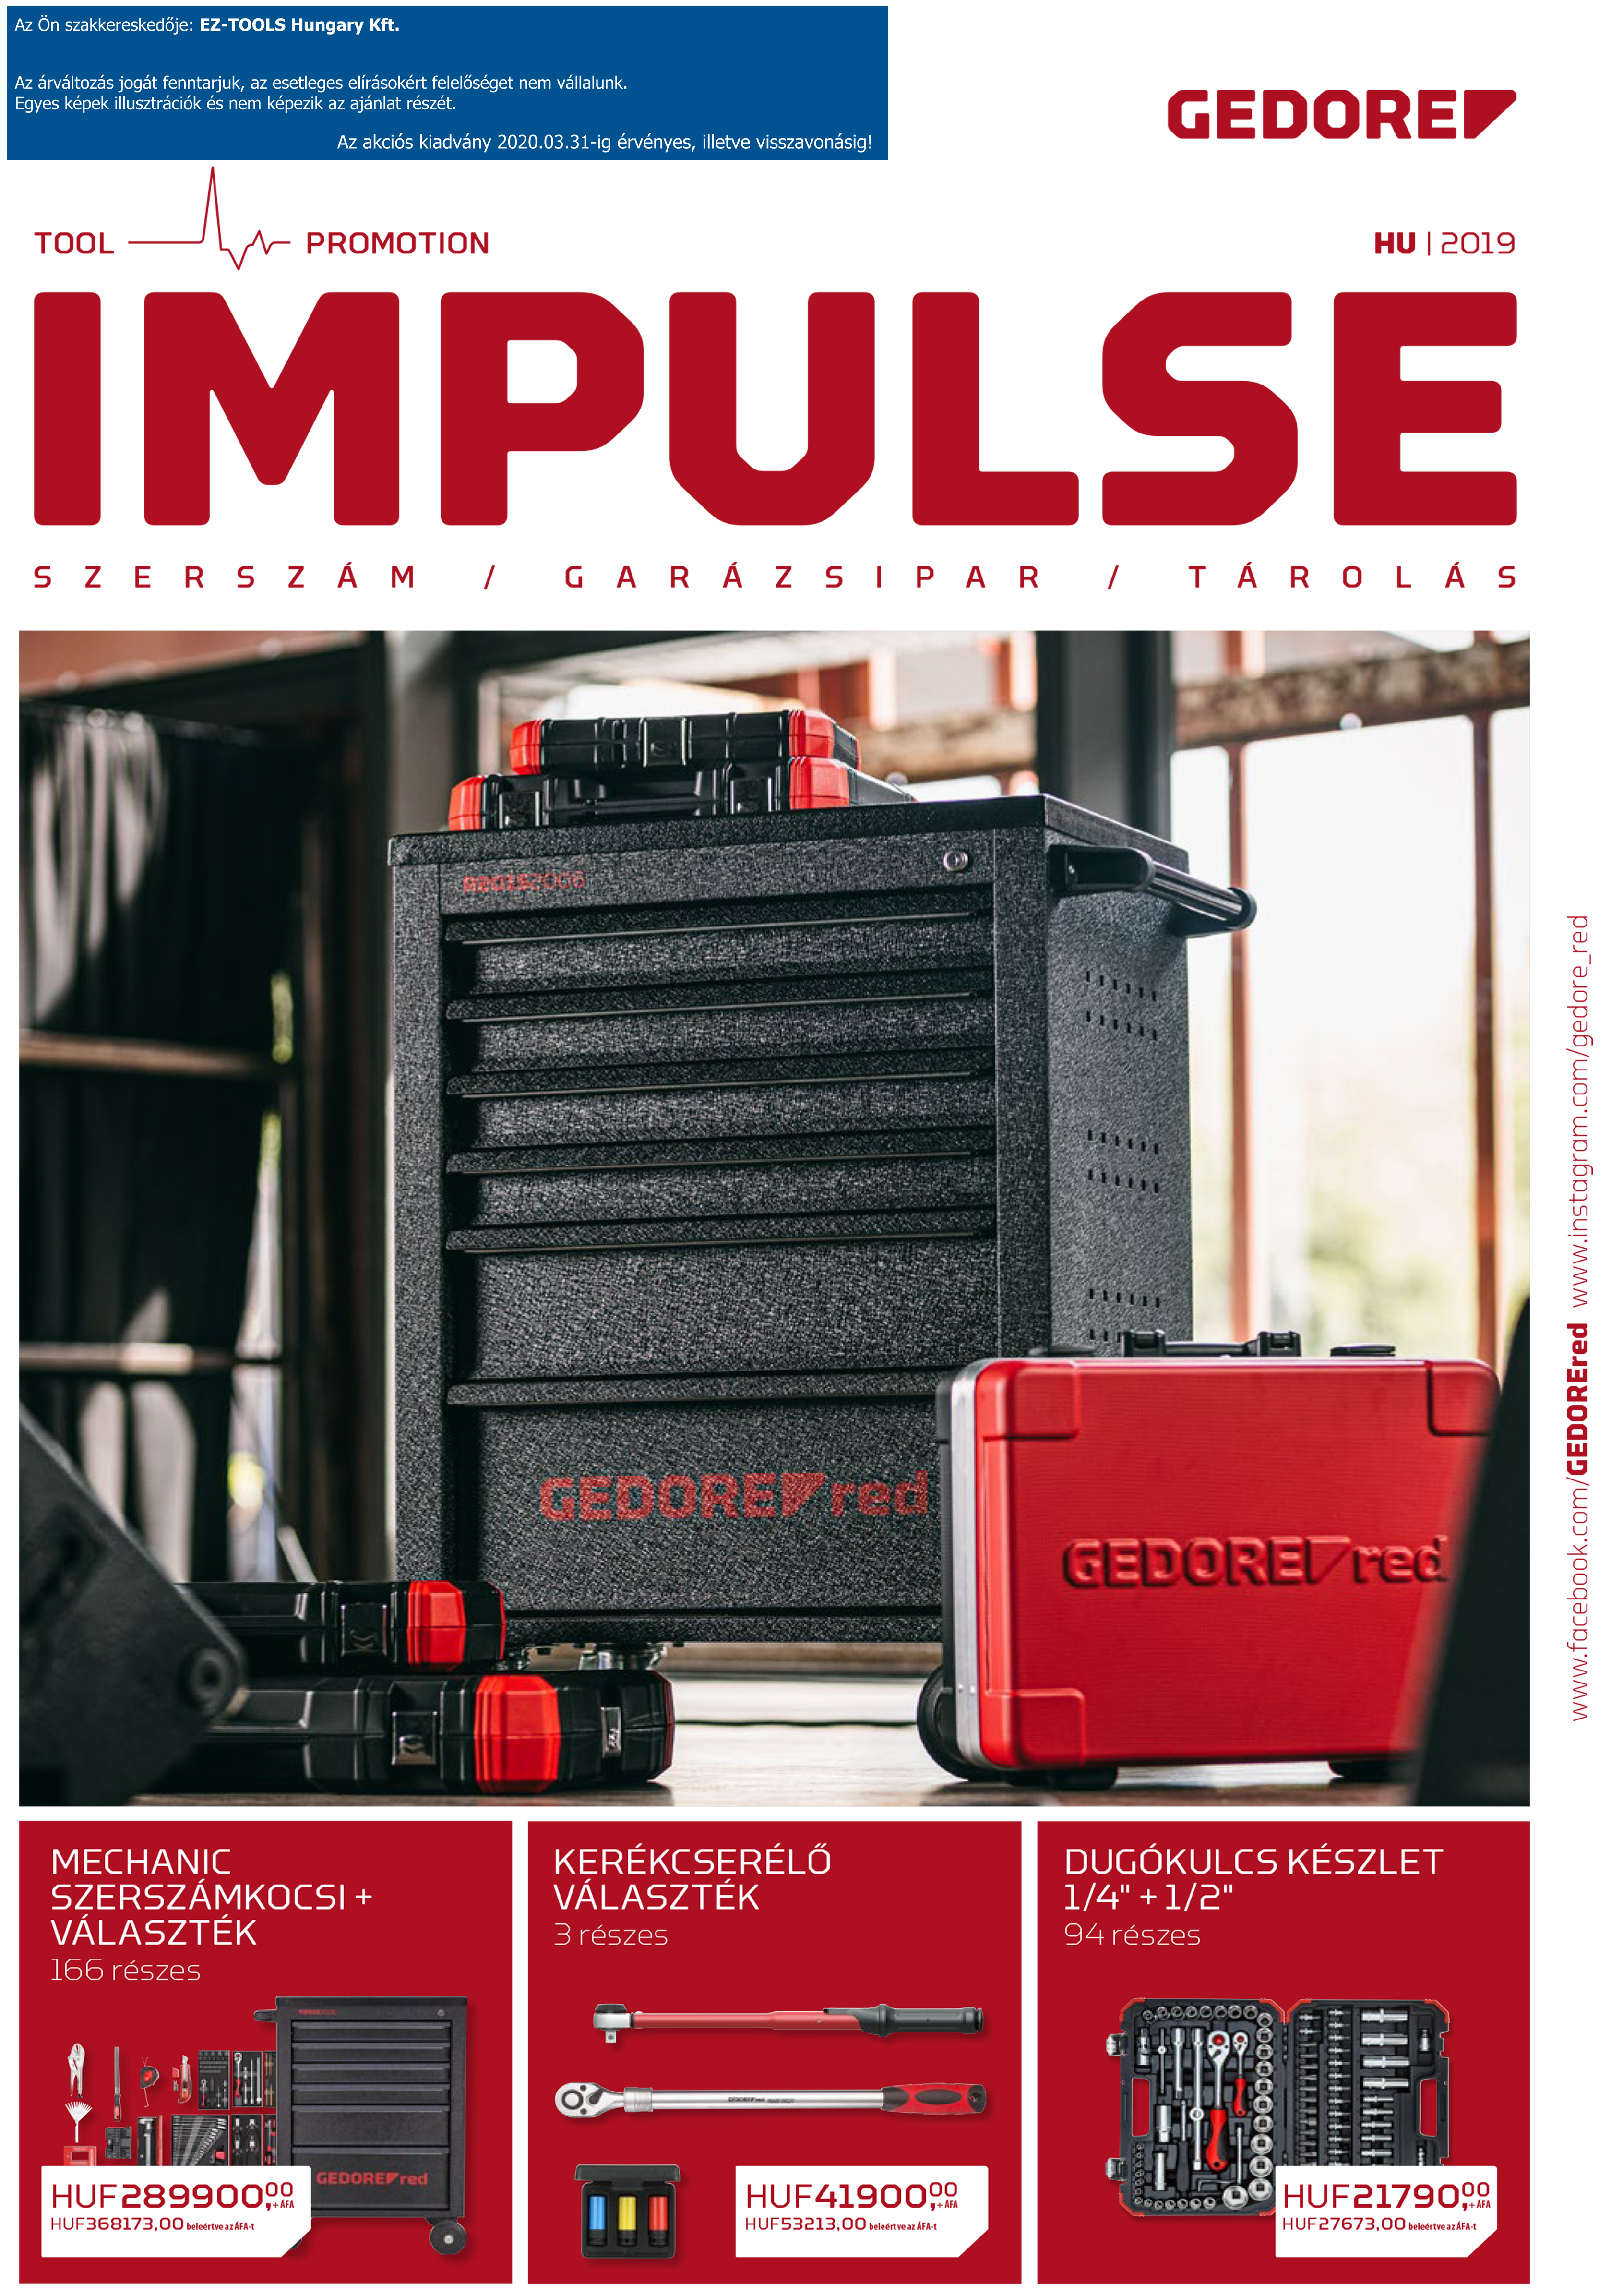 EZ-Tools_GEDORE Red IMPULSE 2020-03-31-ig